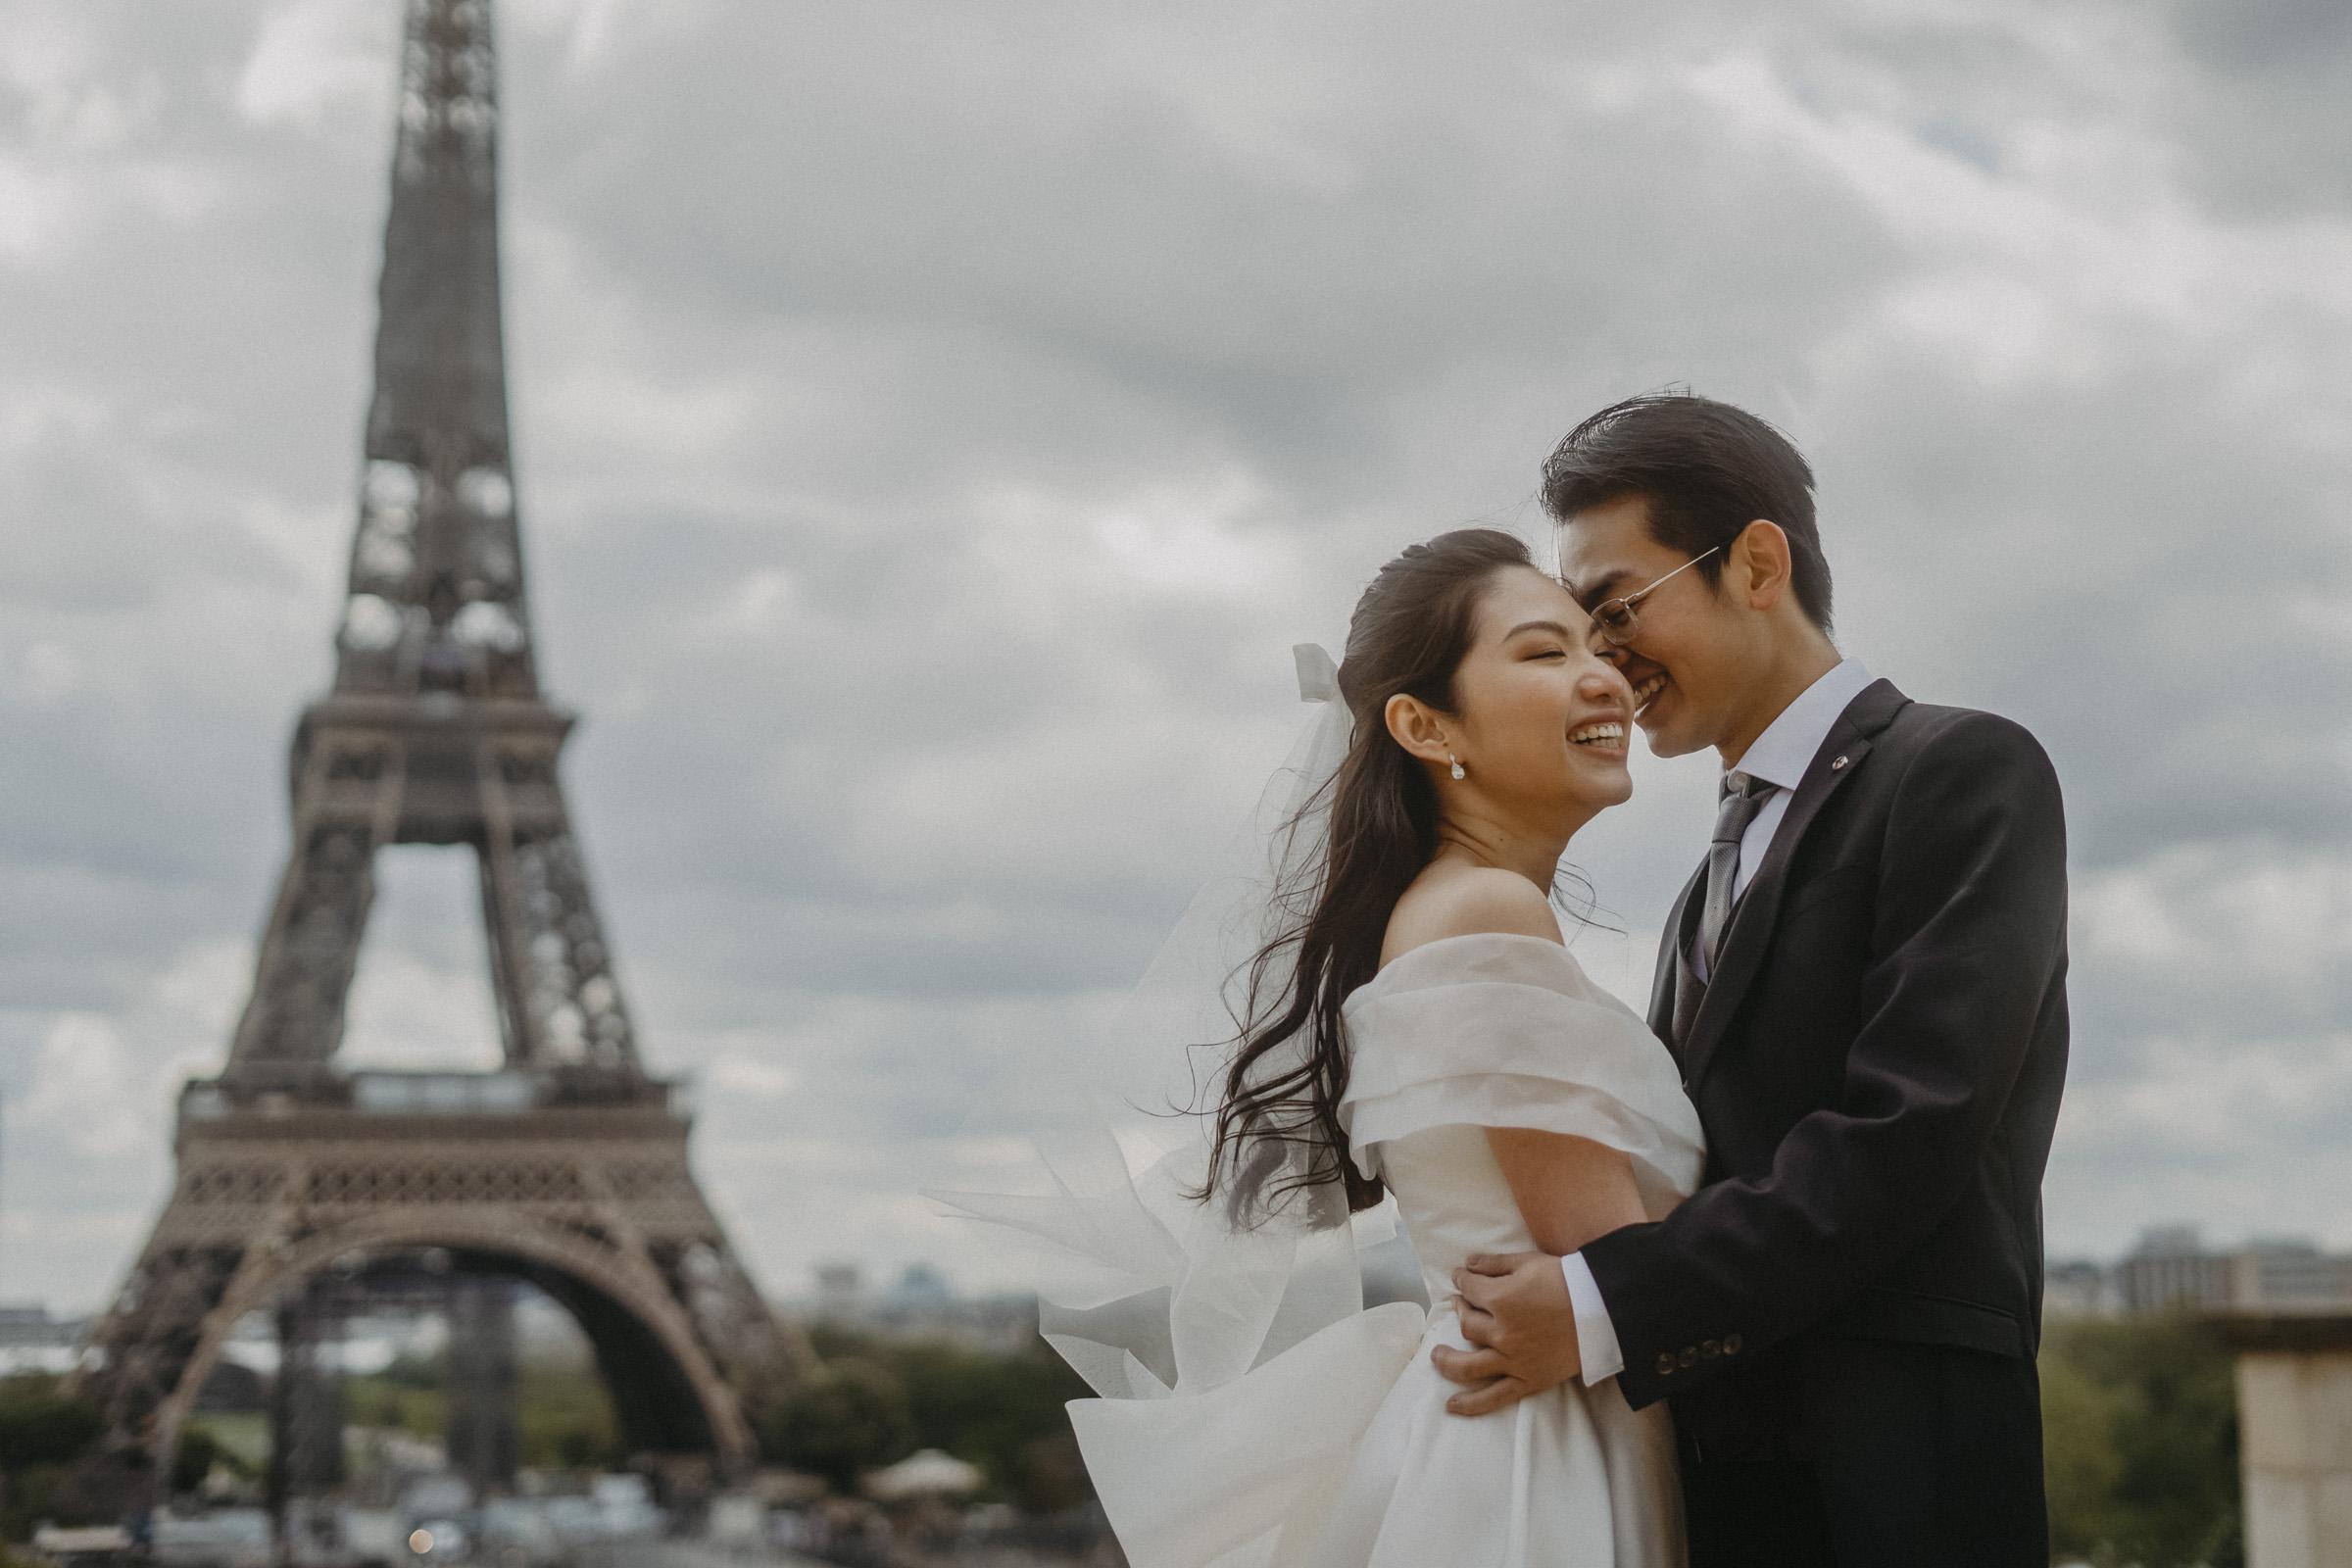 pre-wedding-photos-eiffel-tower-paris